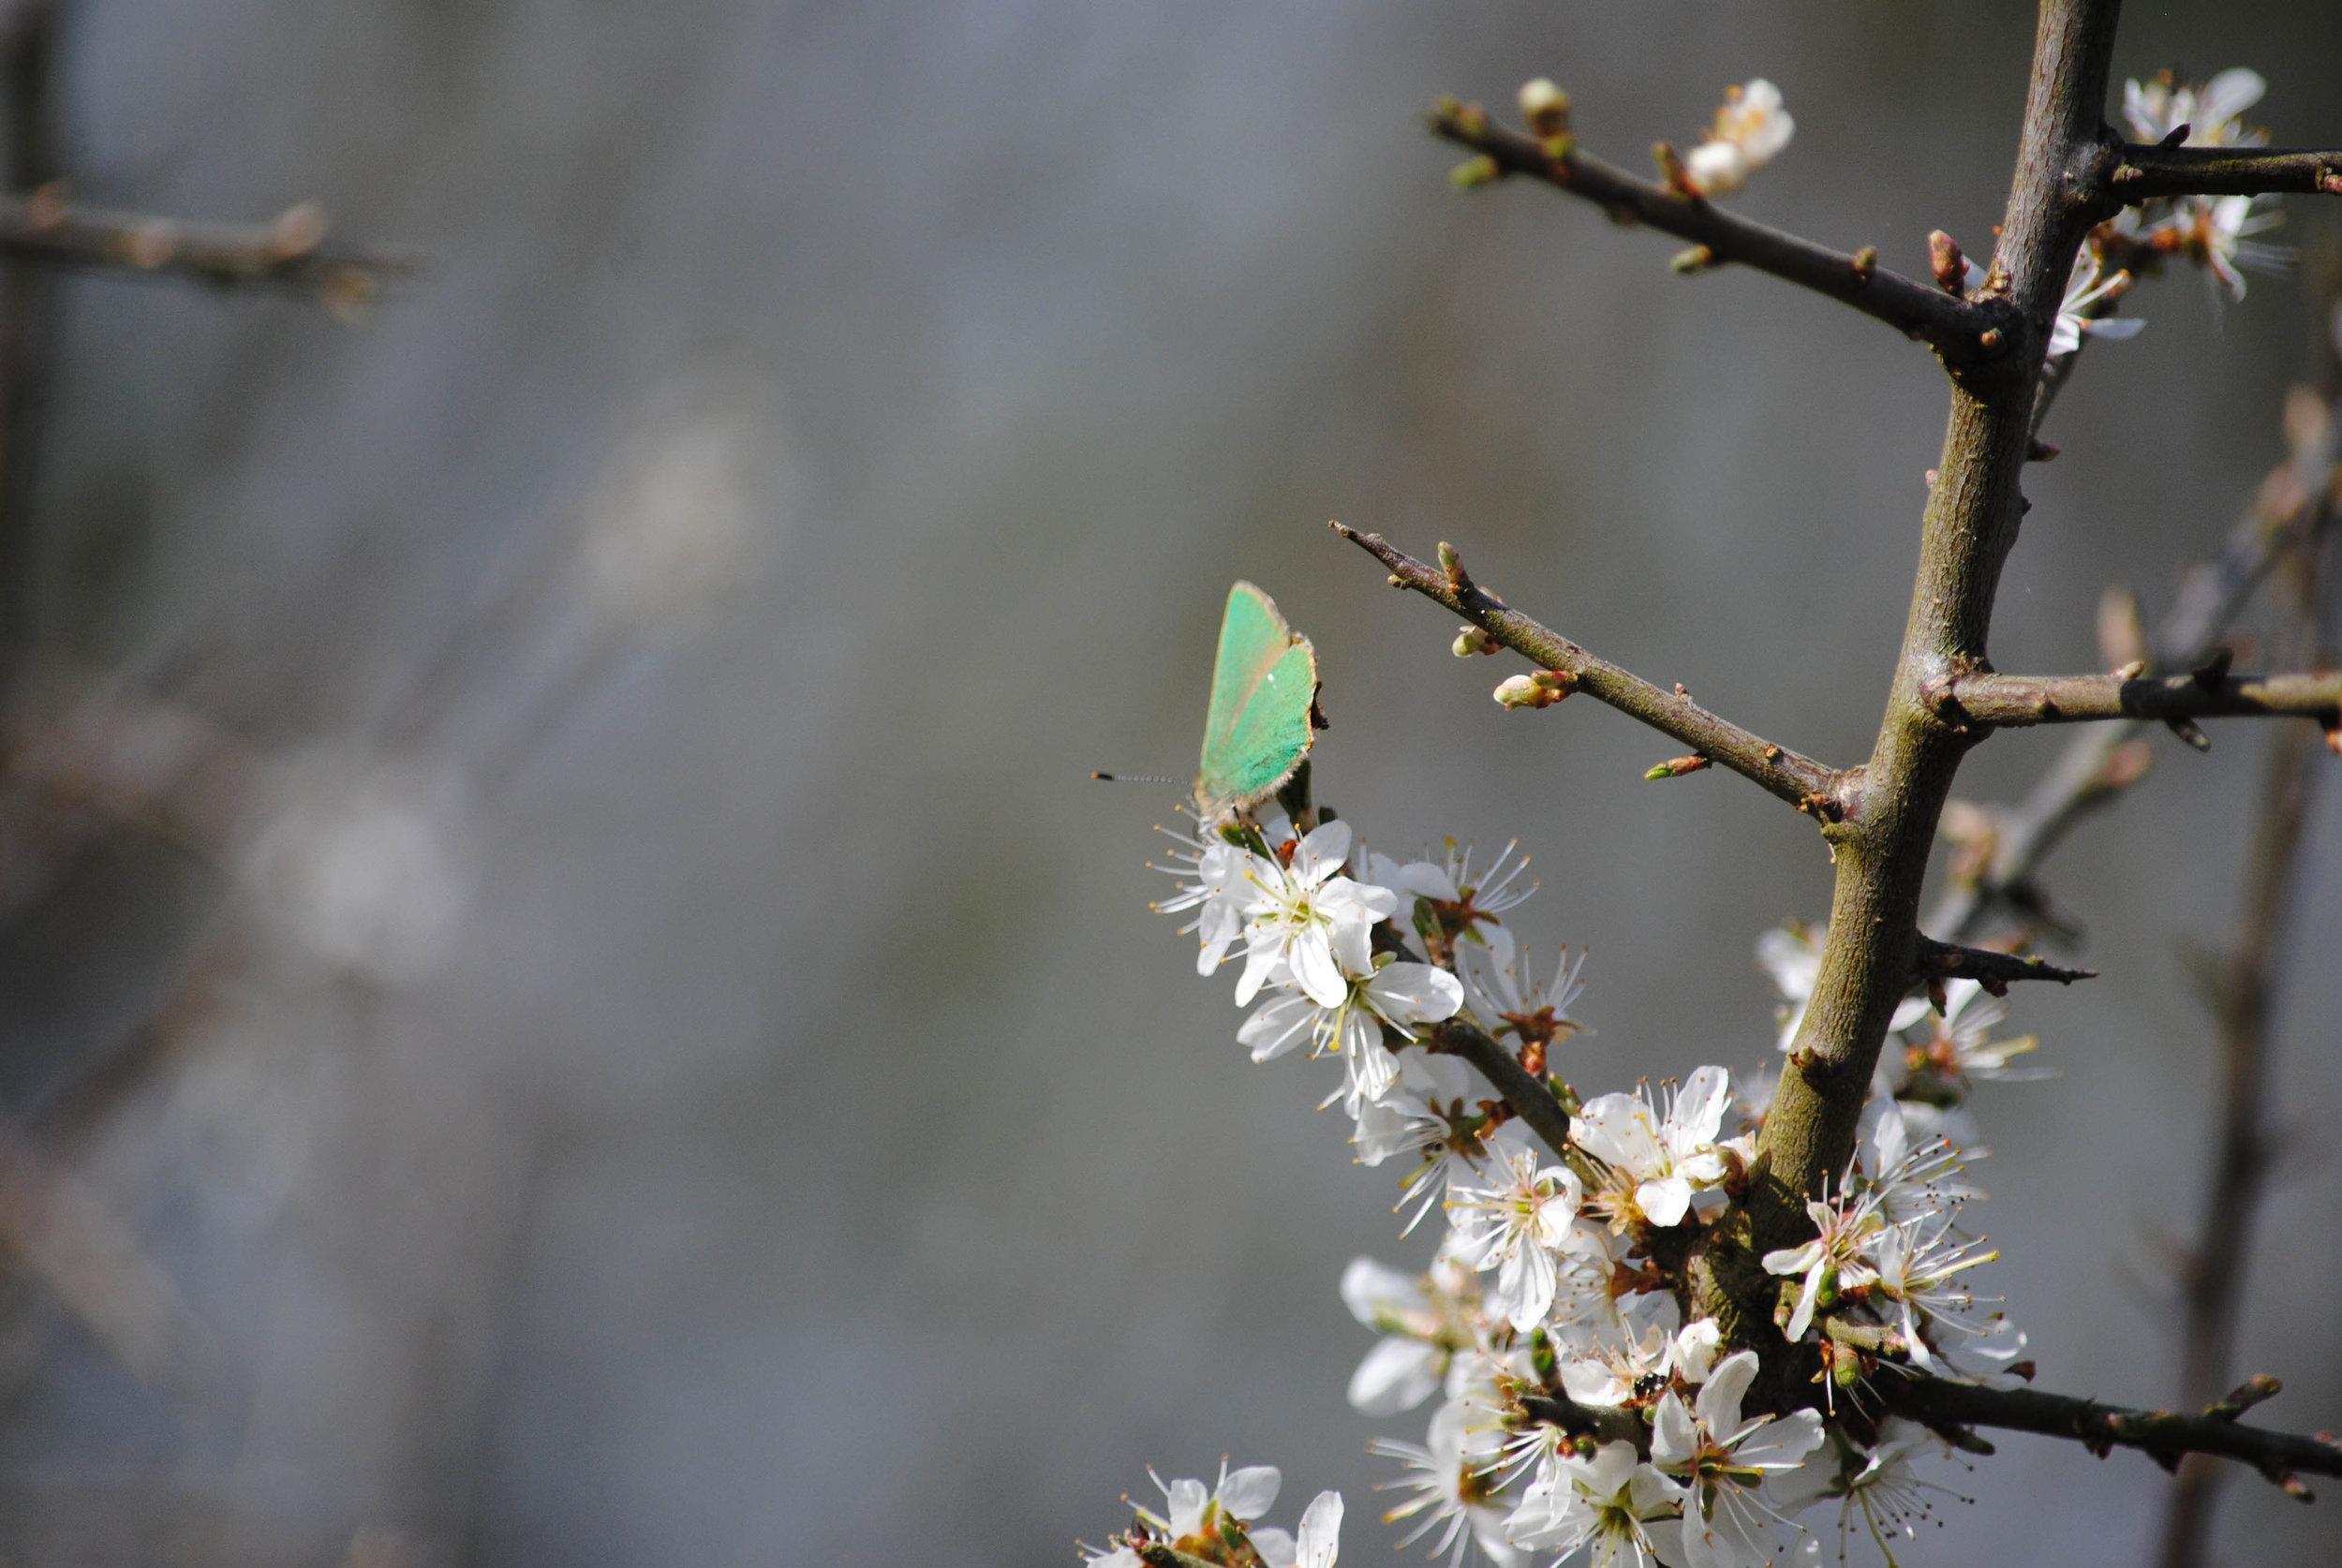 Butterflies of Annaghdown, Galway. Ireland: Green Hairstreak.